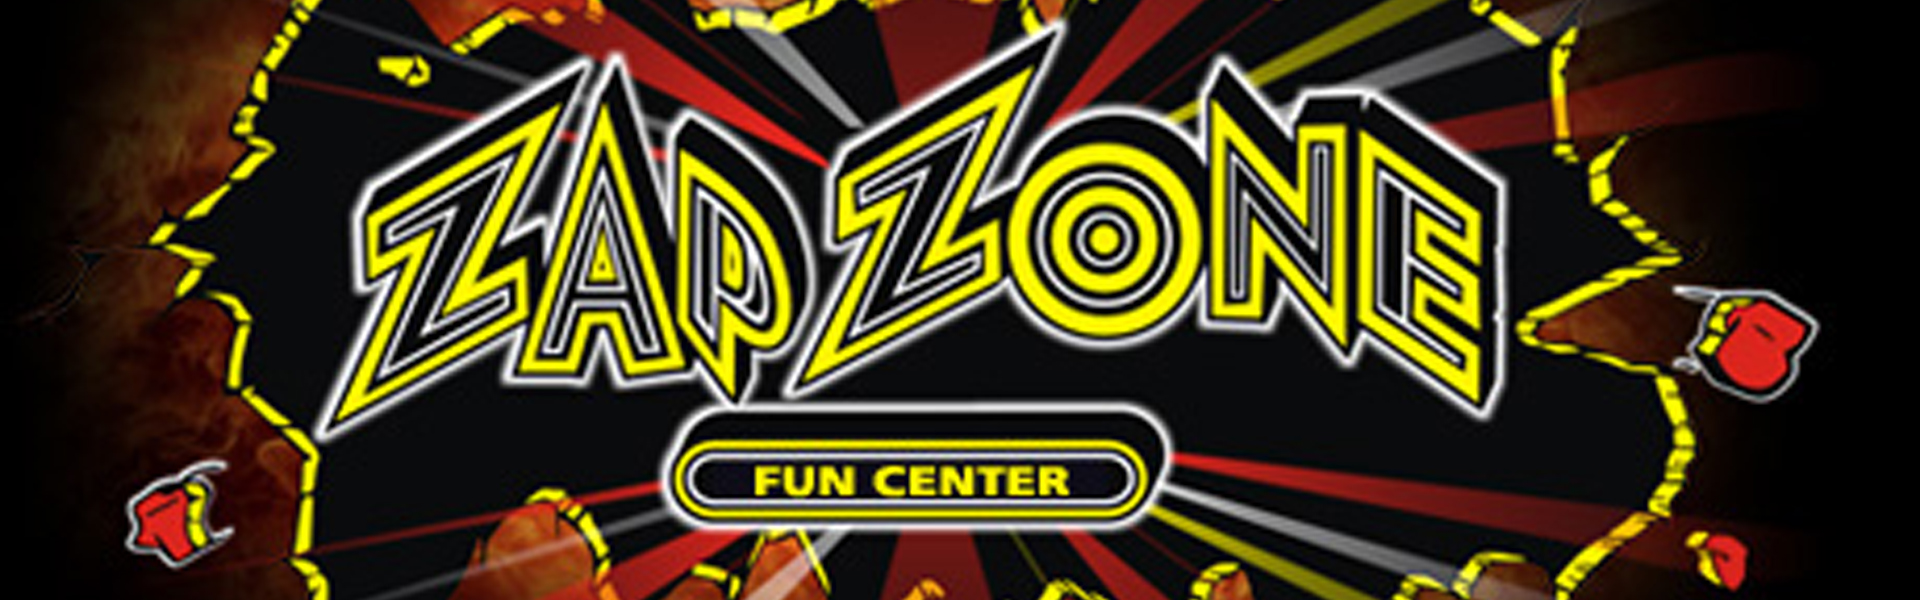 Zap Zone Fun Center Tourism Windsor Essex Pelee Island